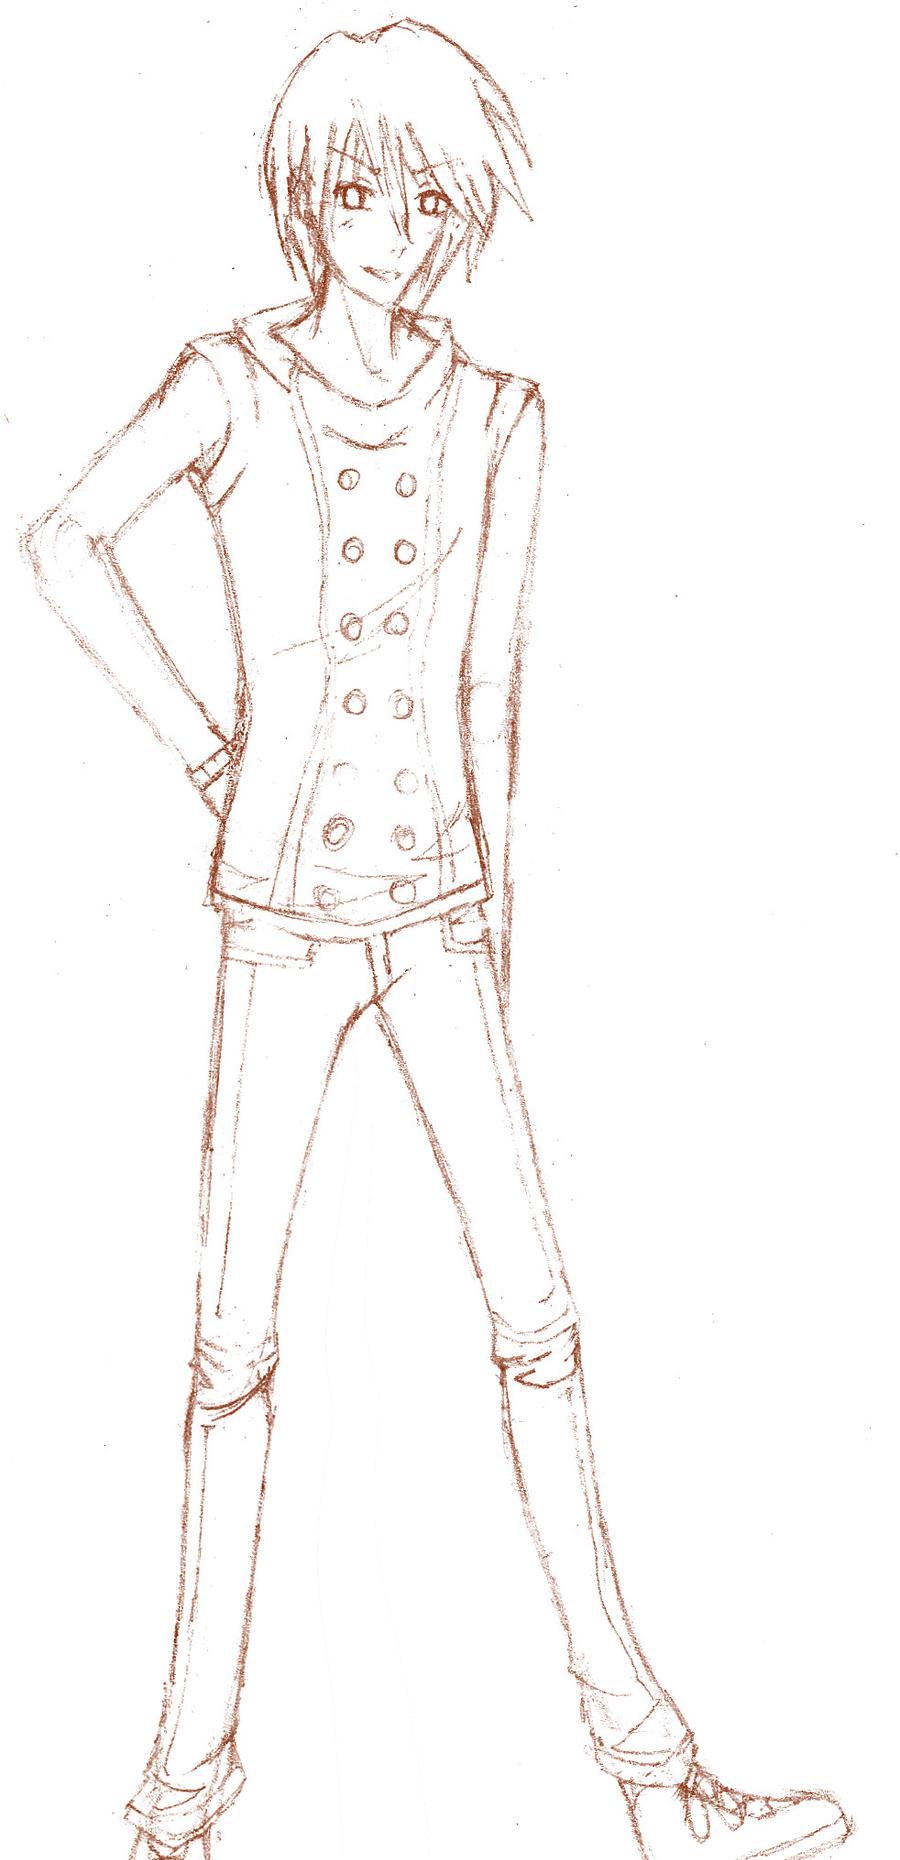 Satoru full body pencil sketch by pheoniic on deviantart for Easy body drawings